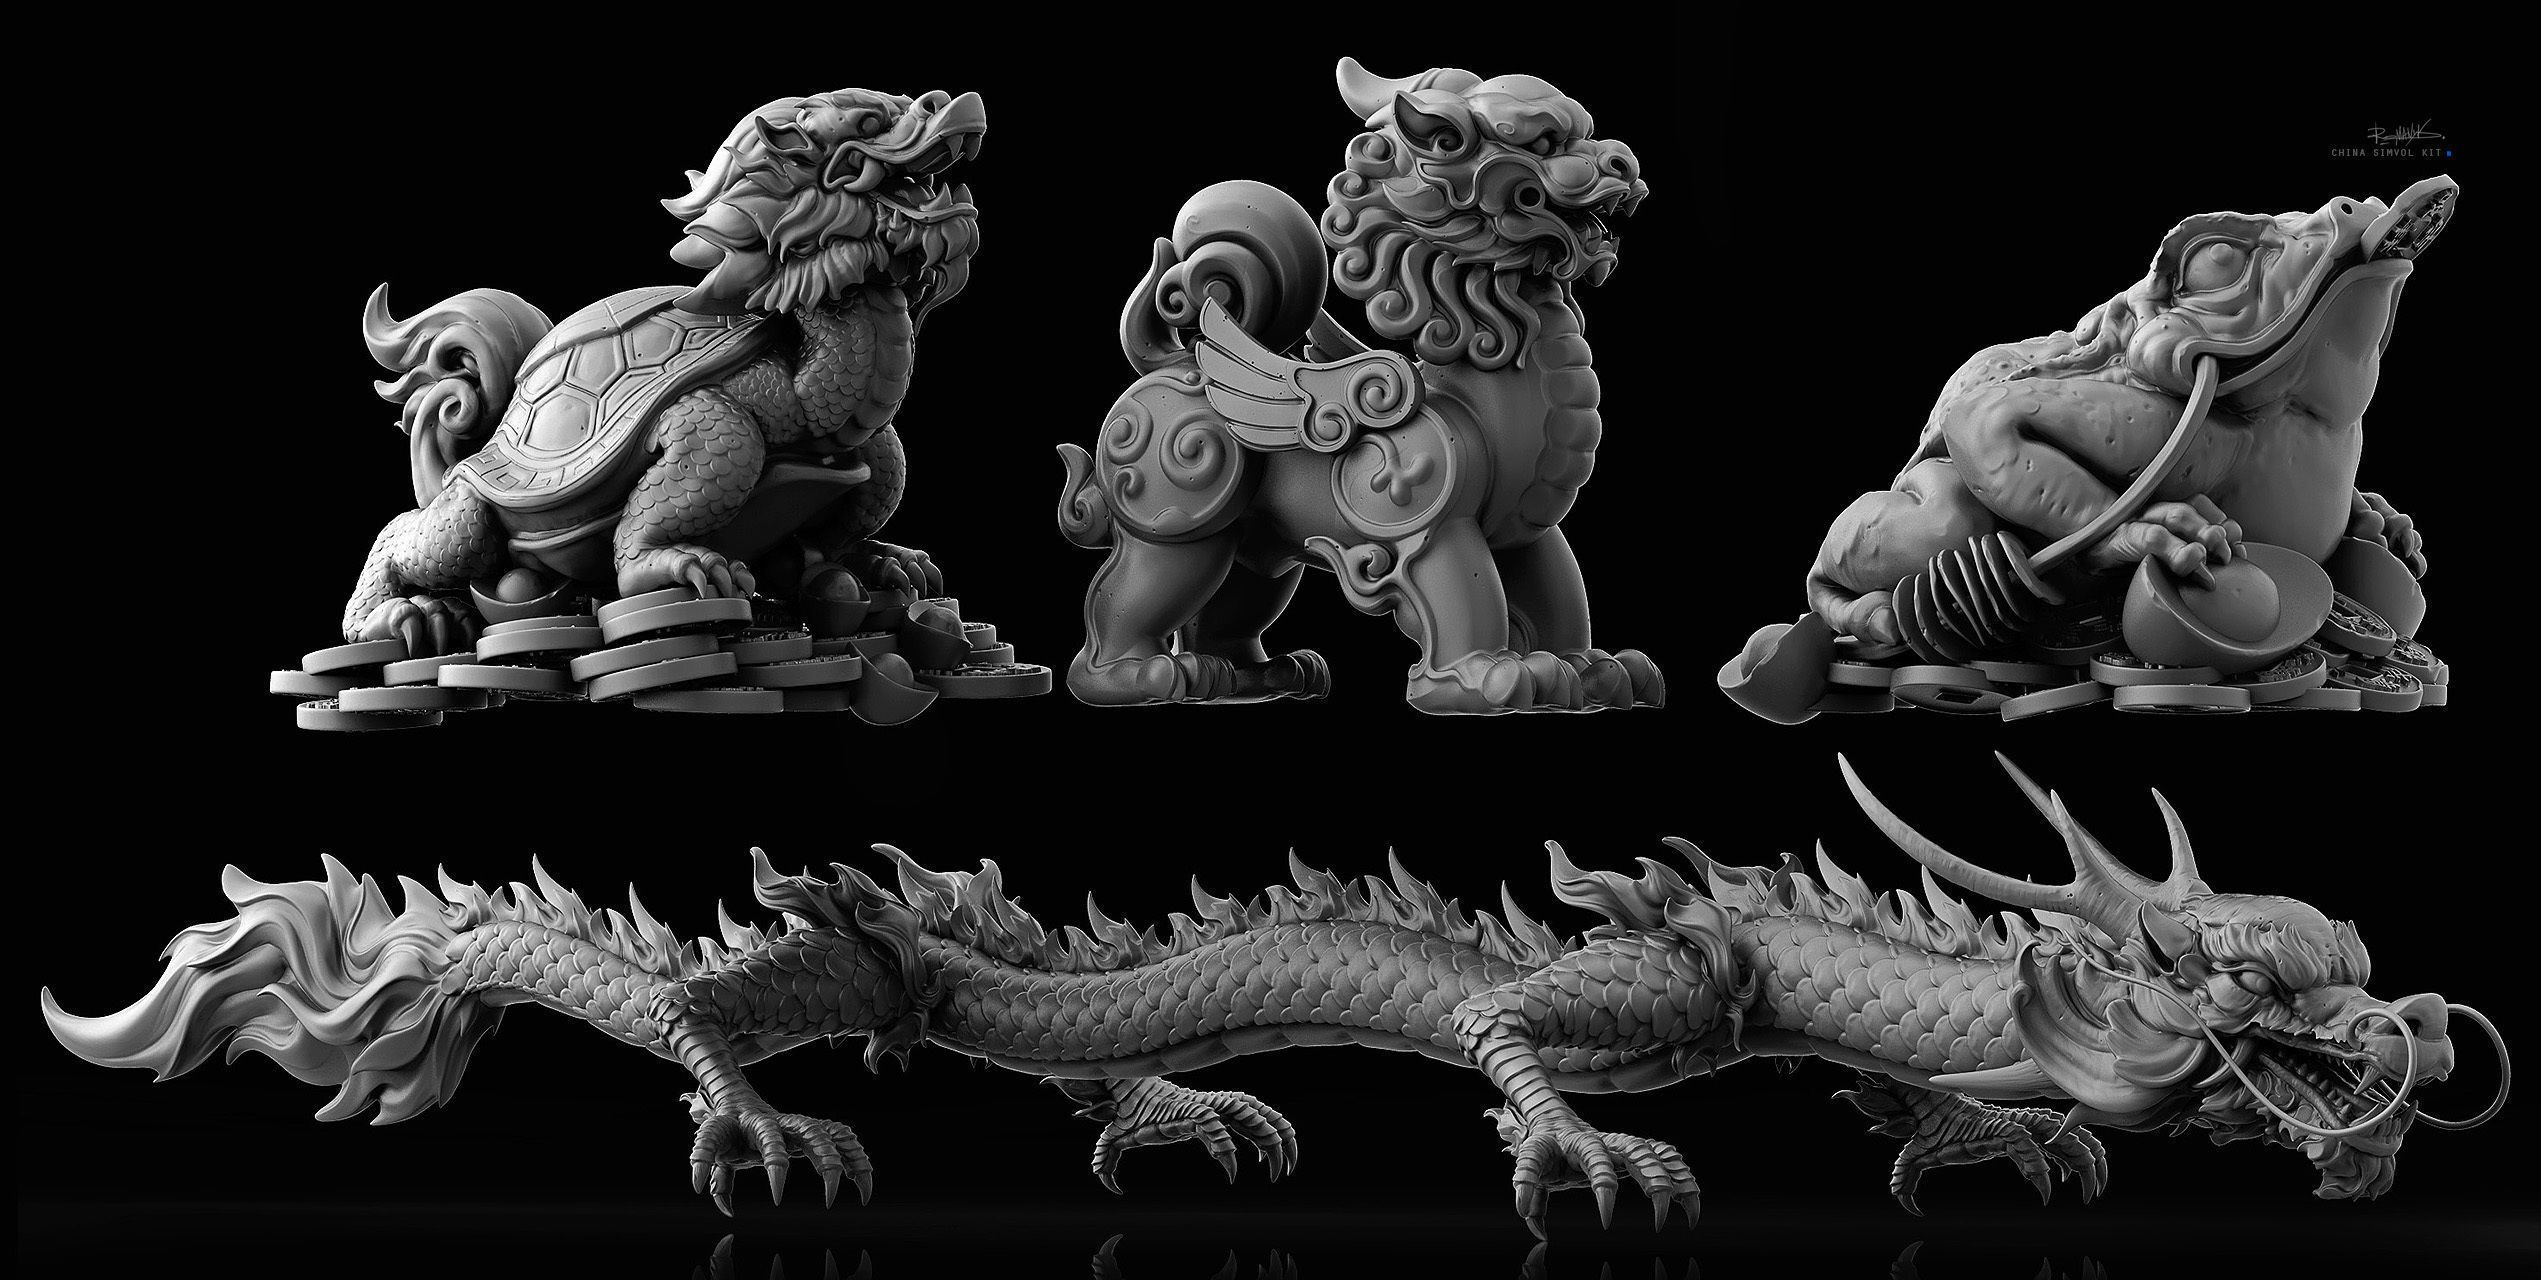 Chinese symbols kit 3D model Chinese symbols, Props